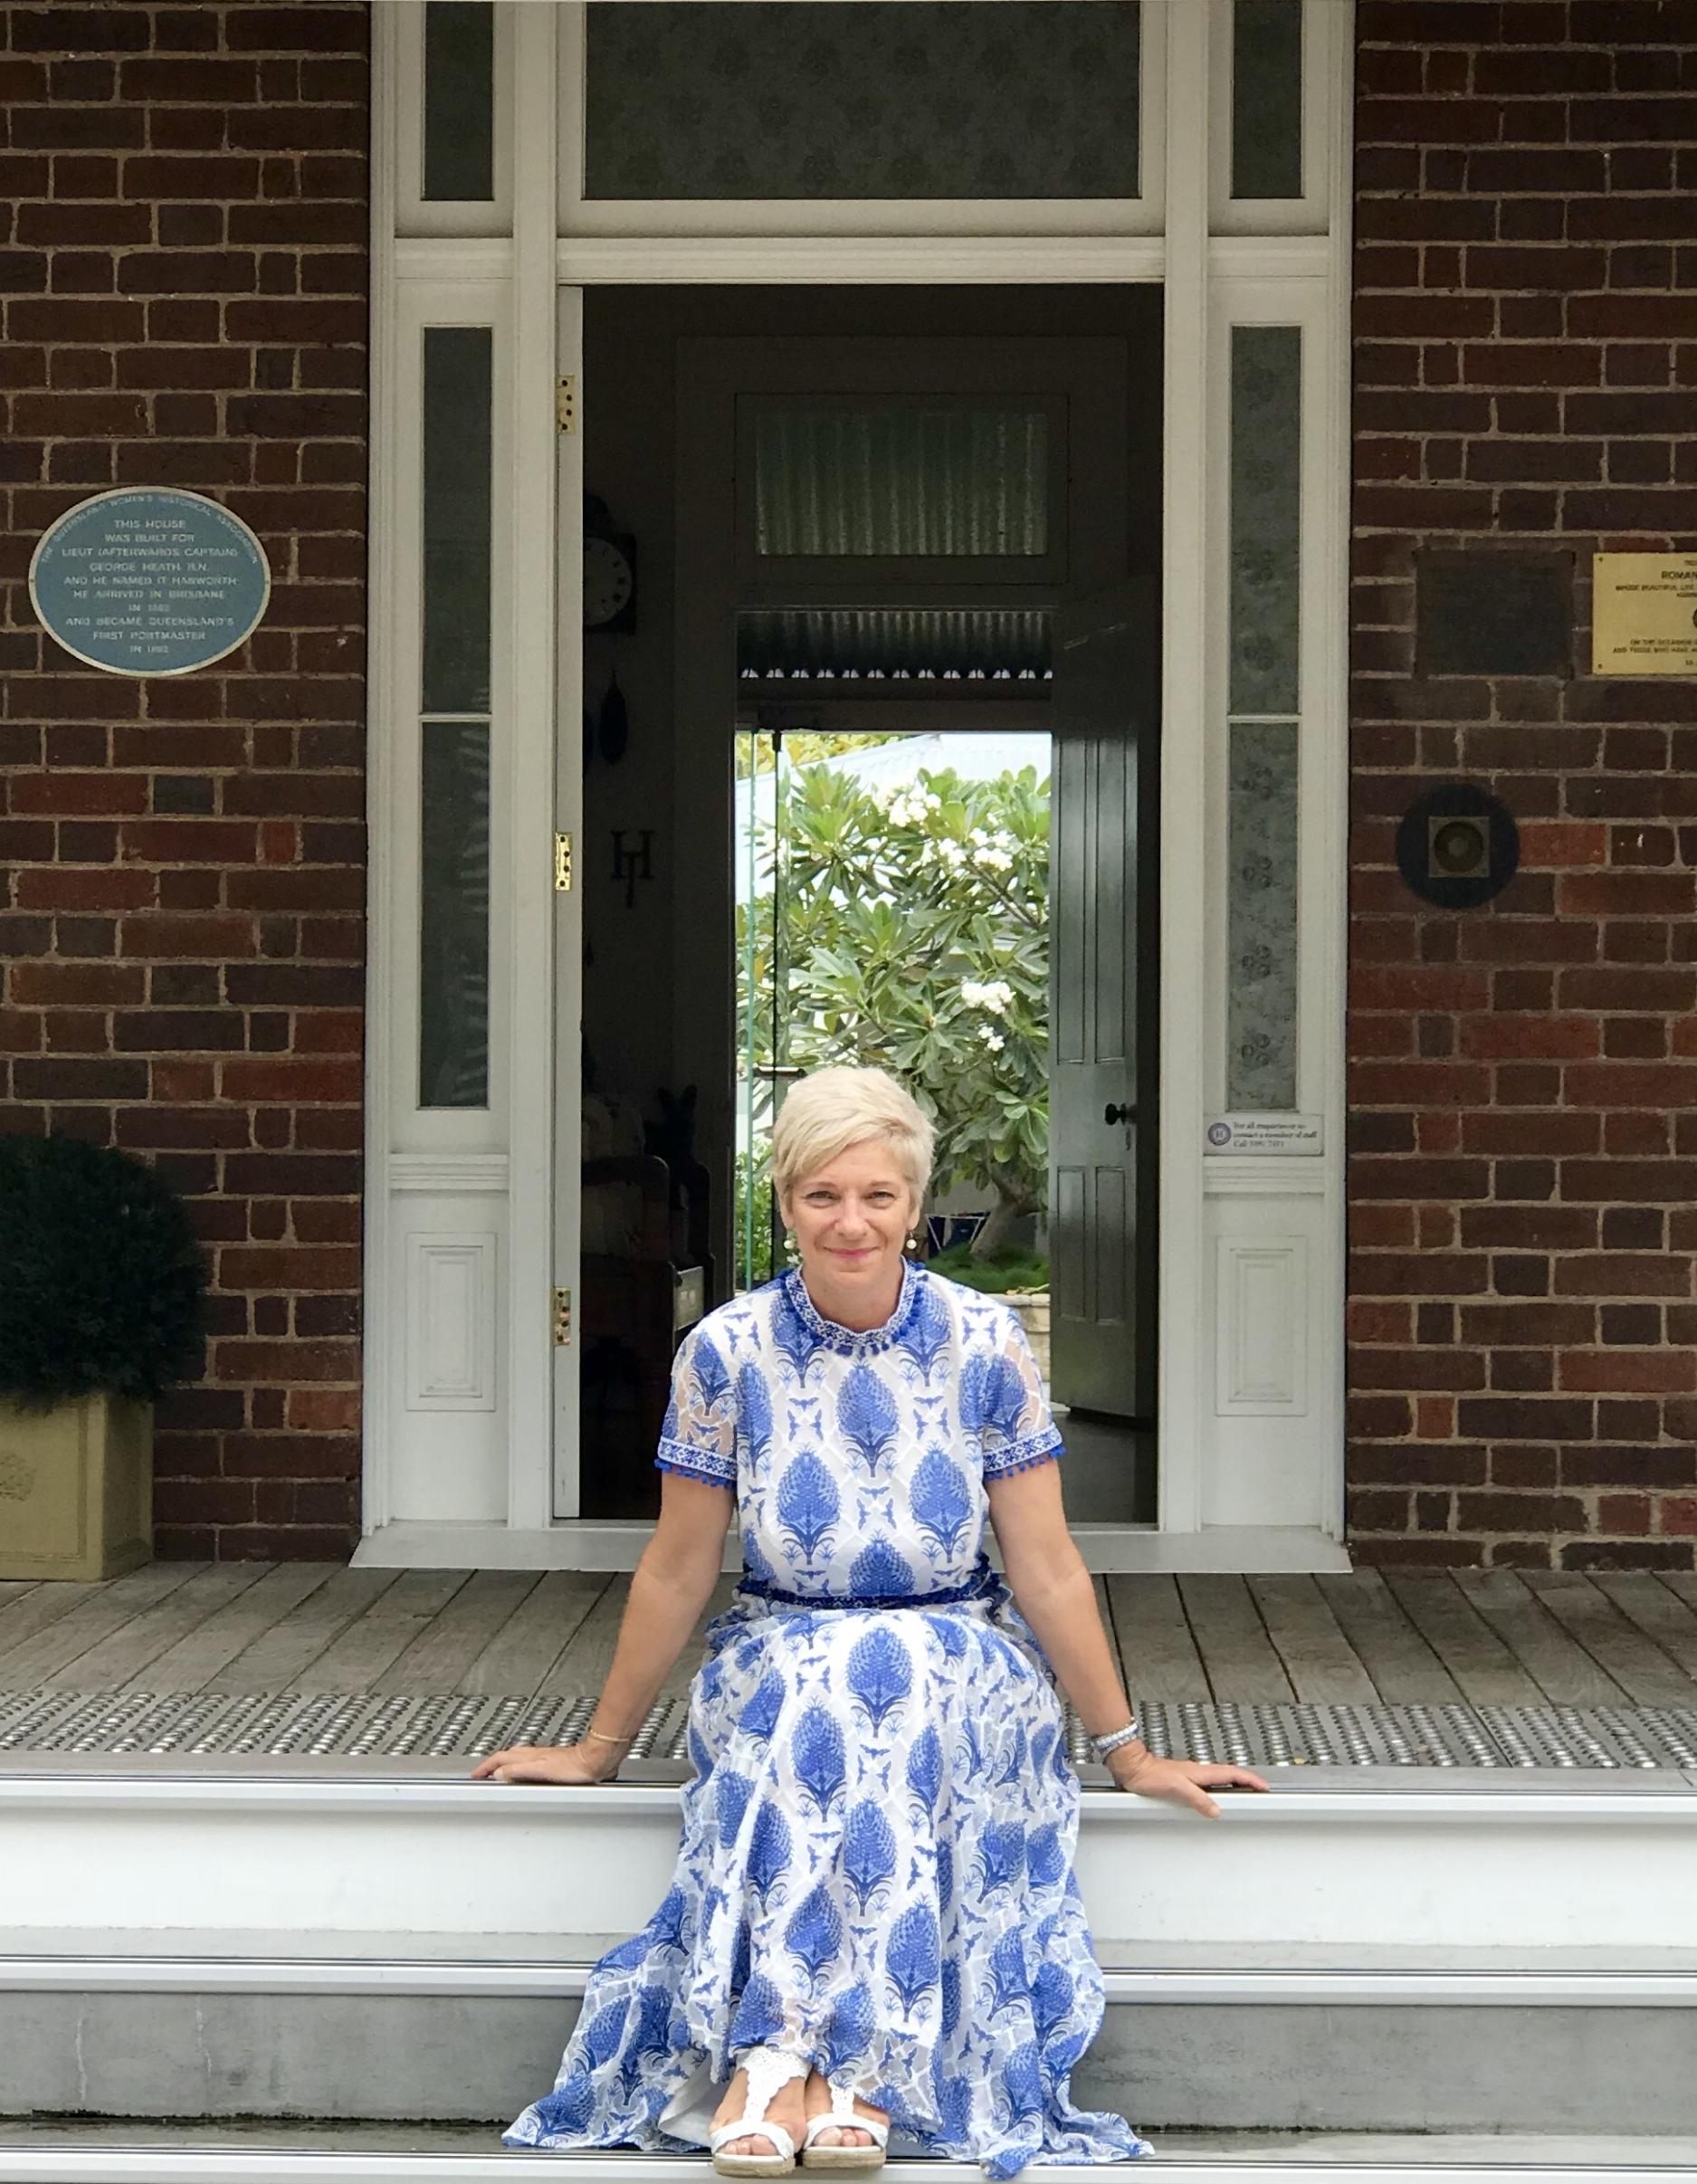 Lady Brisbane Hanworth House